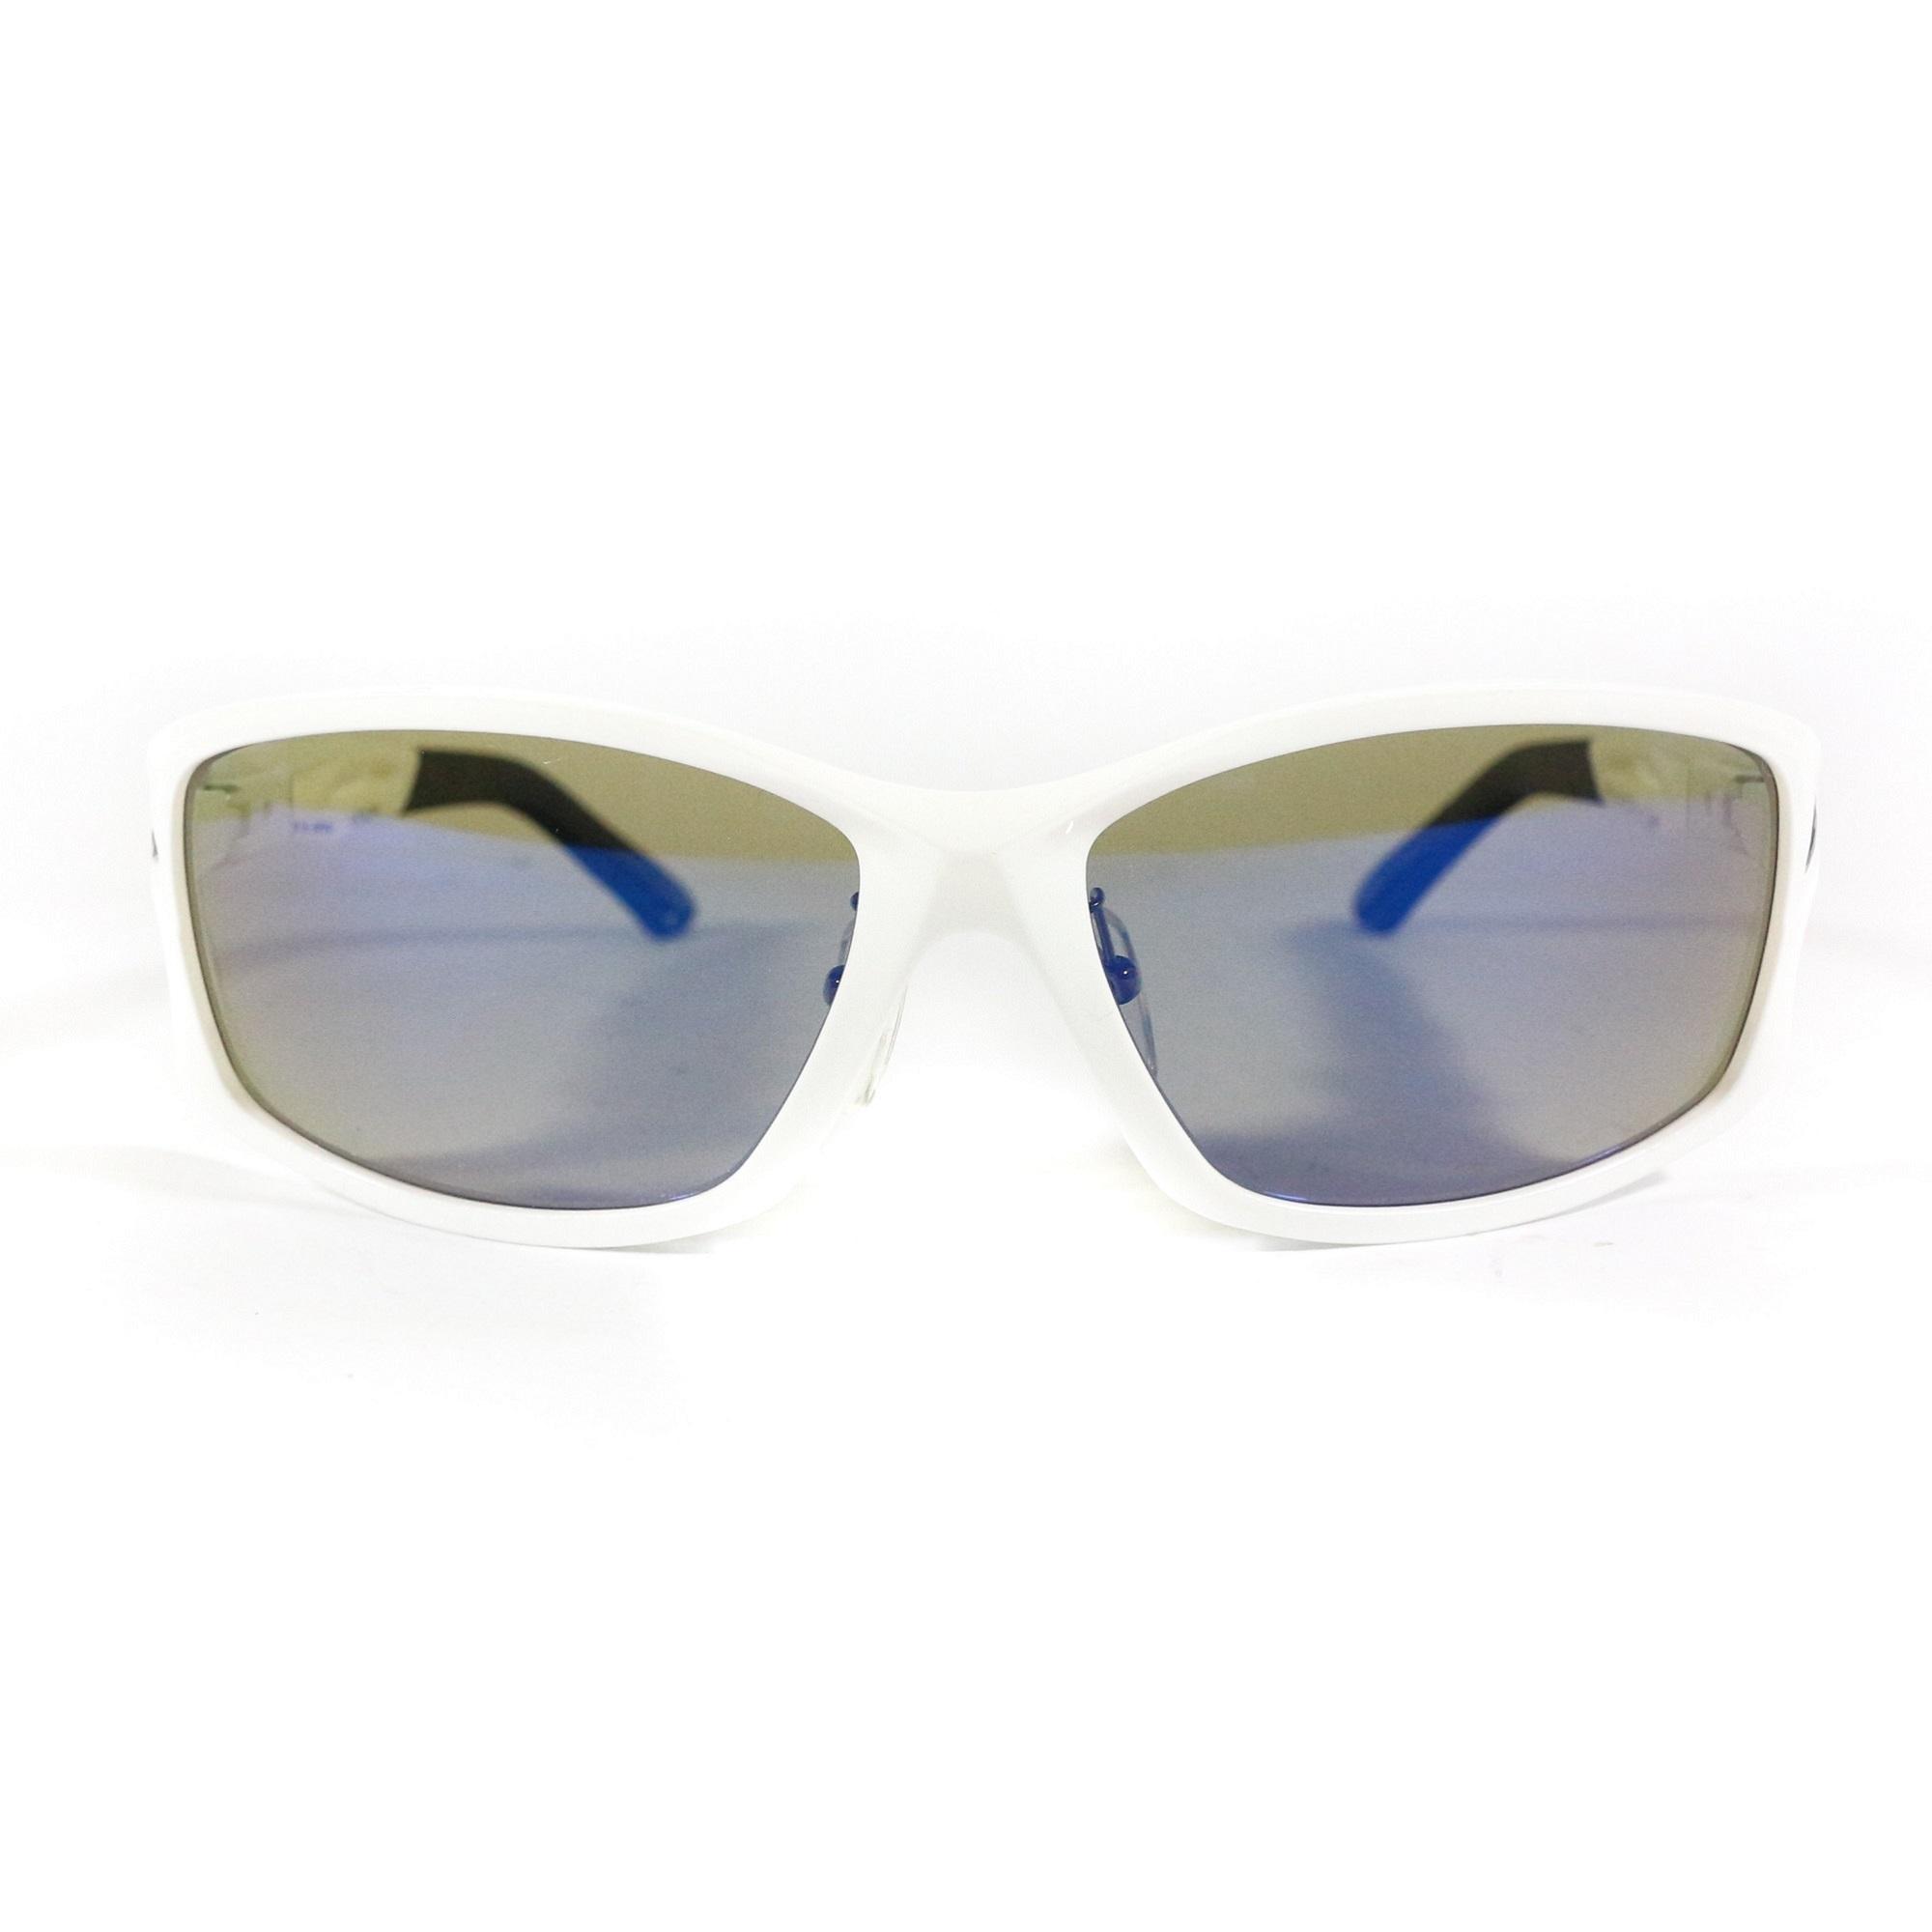 Zeque Polarised Fishing Sunglasses Stealth F-1395 BLUE MIRROR TVS (6511)